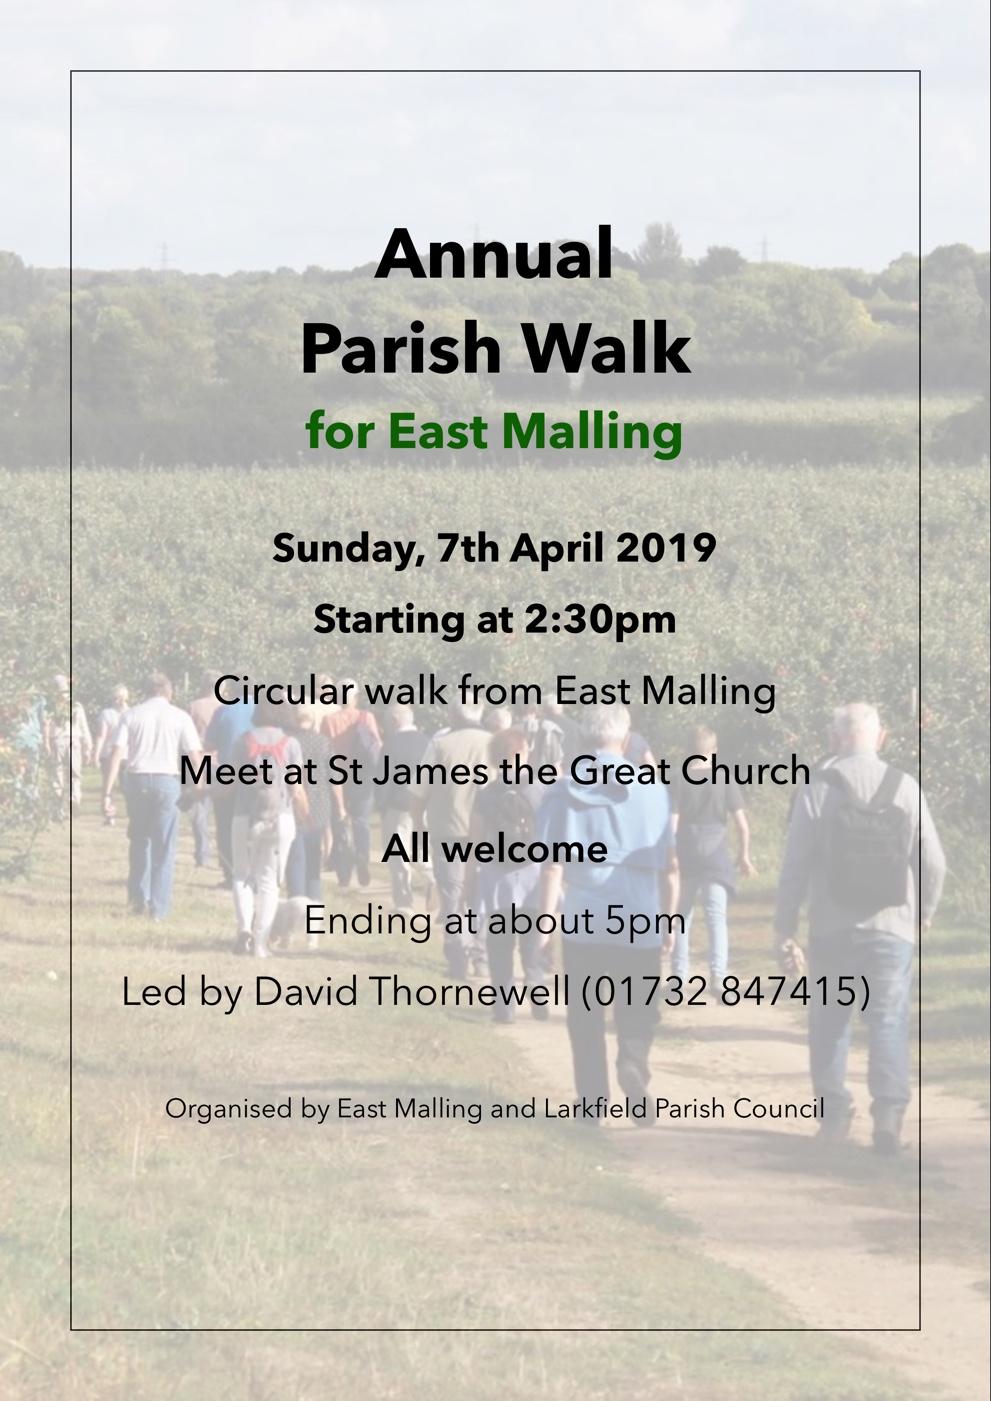 Annual Parish Walk for East Malling